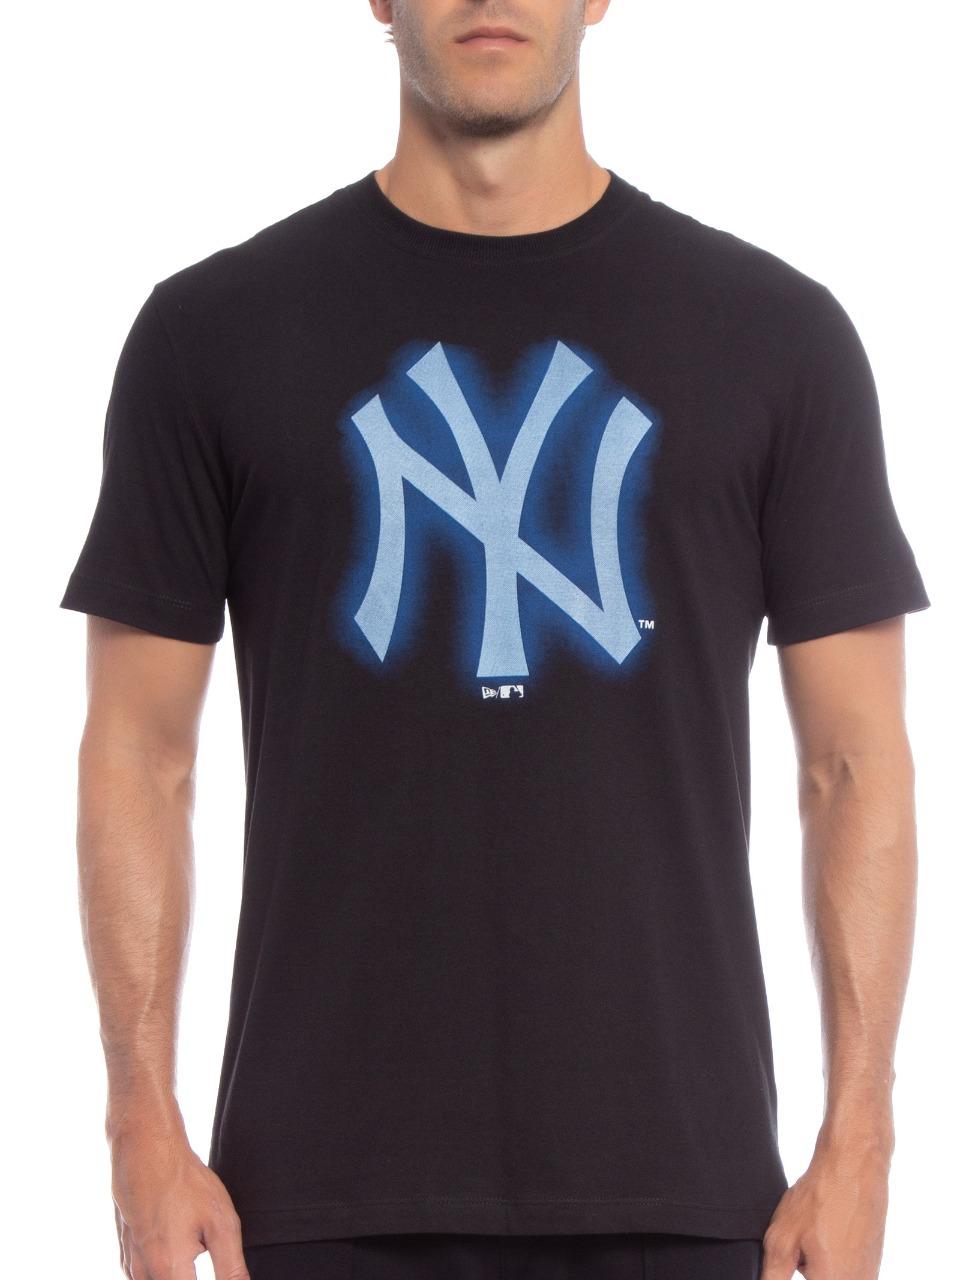 Camiseta Masculina New Era New York Yankees Rave Space Preta